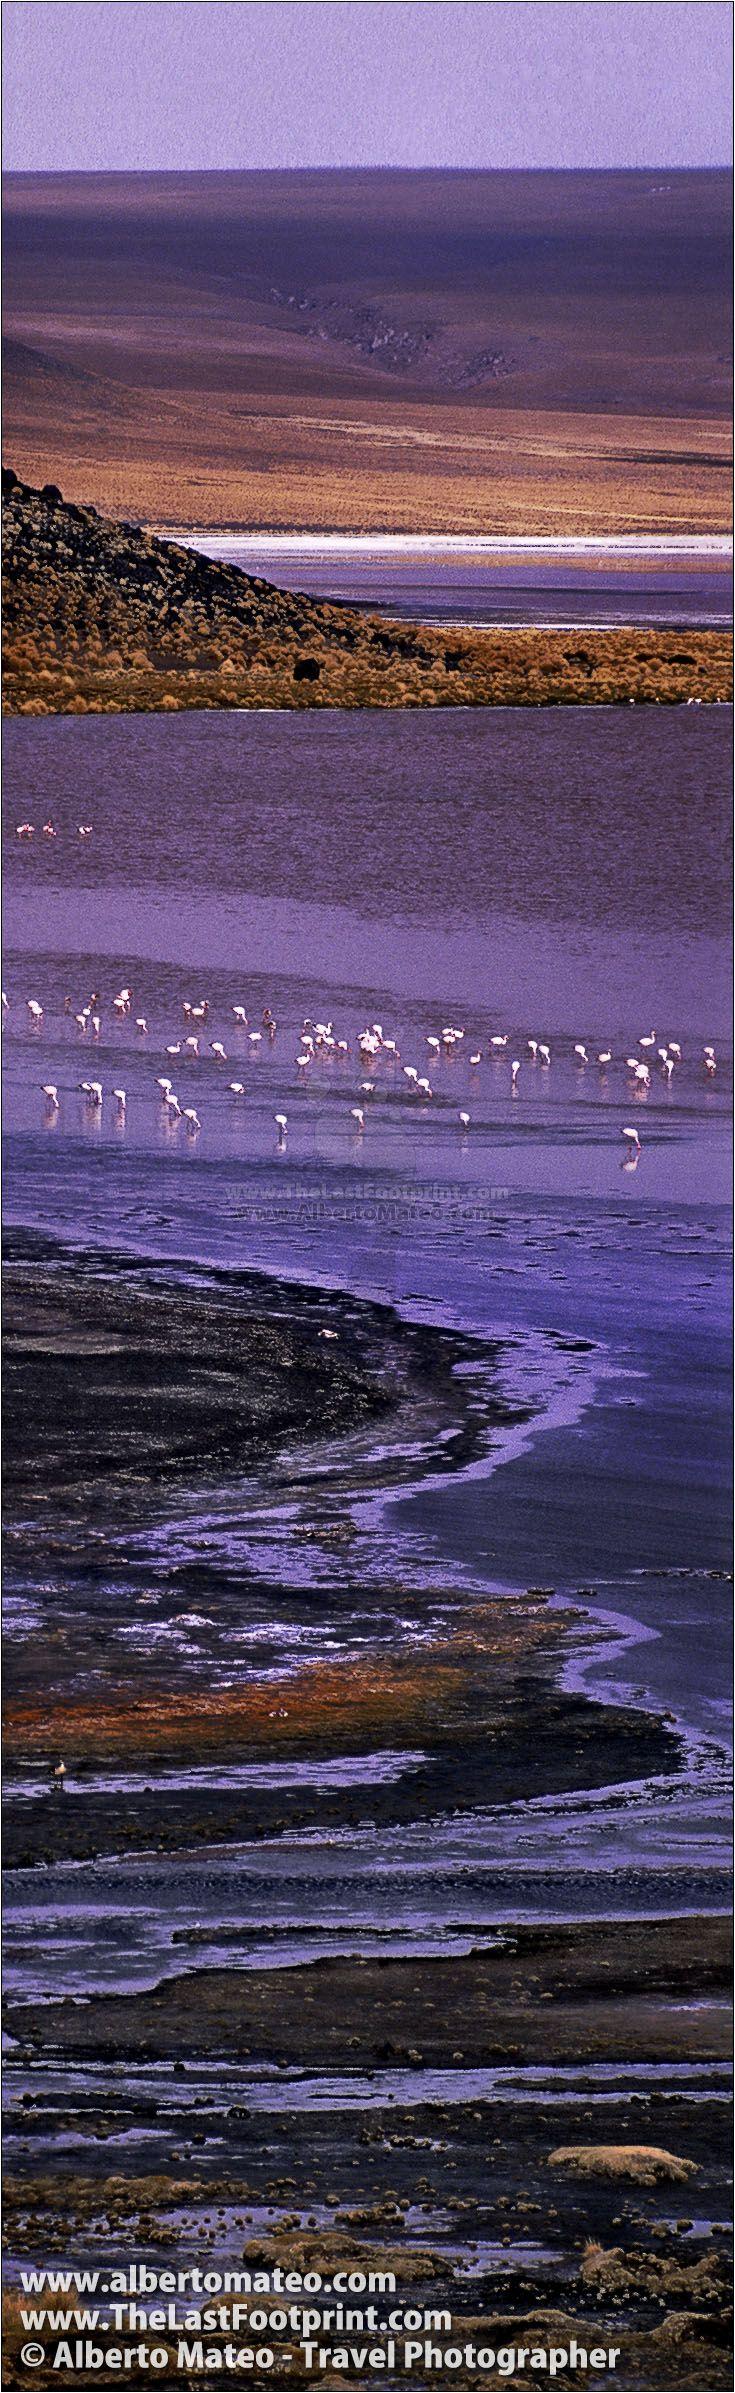 Flamingos in Laguna Colorada, near Uyuni, Altiplano, Bolivia. Landscape Photography by Alberto Mateo, Travel Photographer.